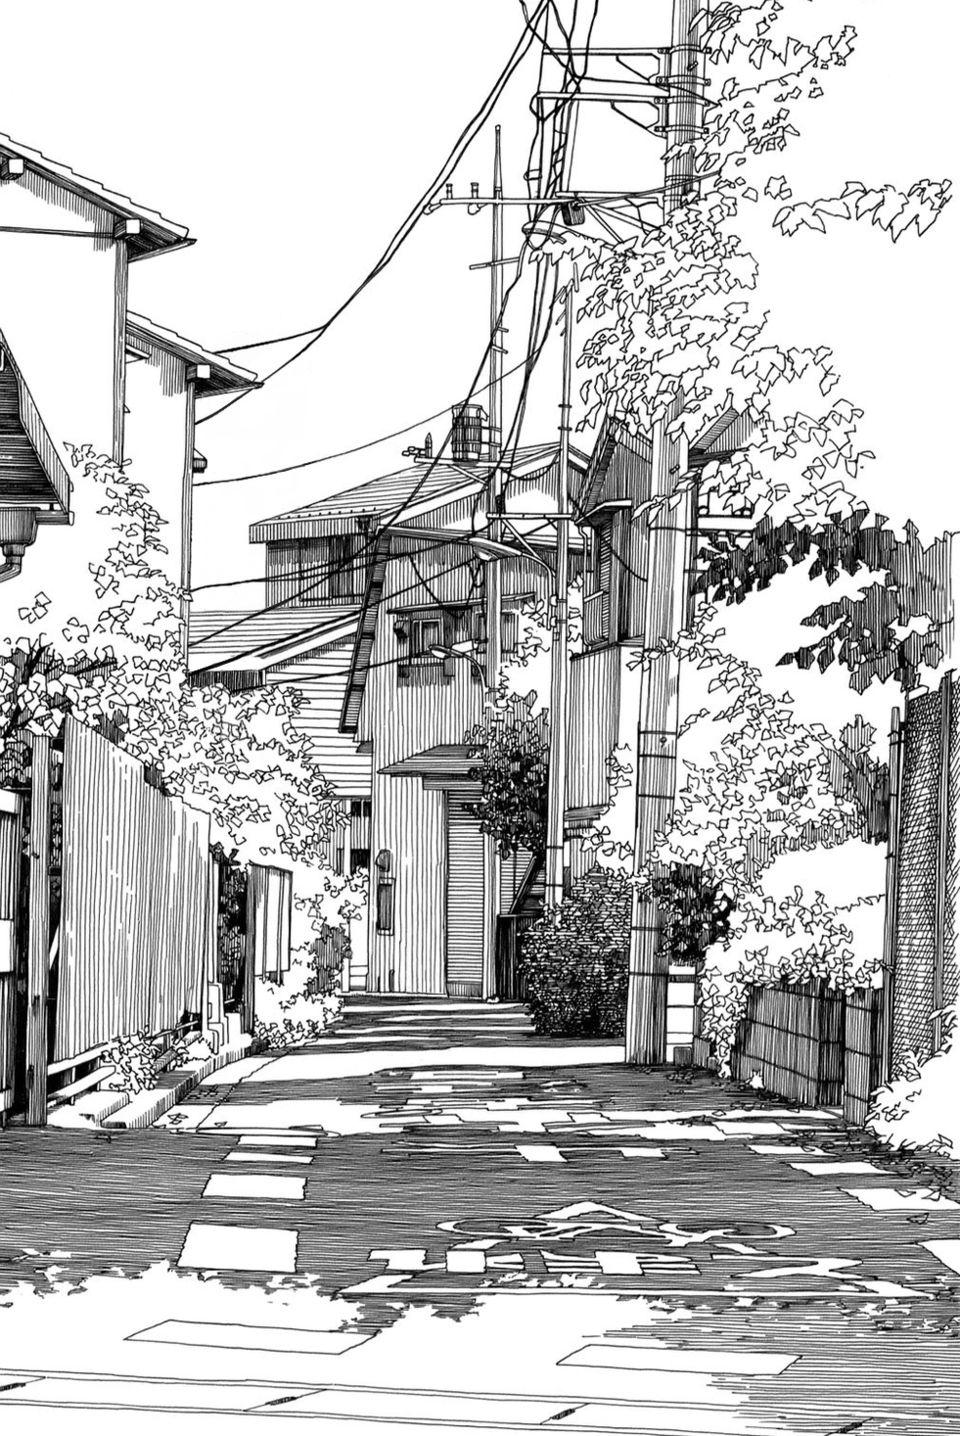 Awesome Manga Background Cityscape Drawing Landscape Drawings Landscape Sketch